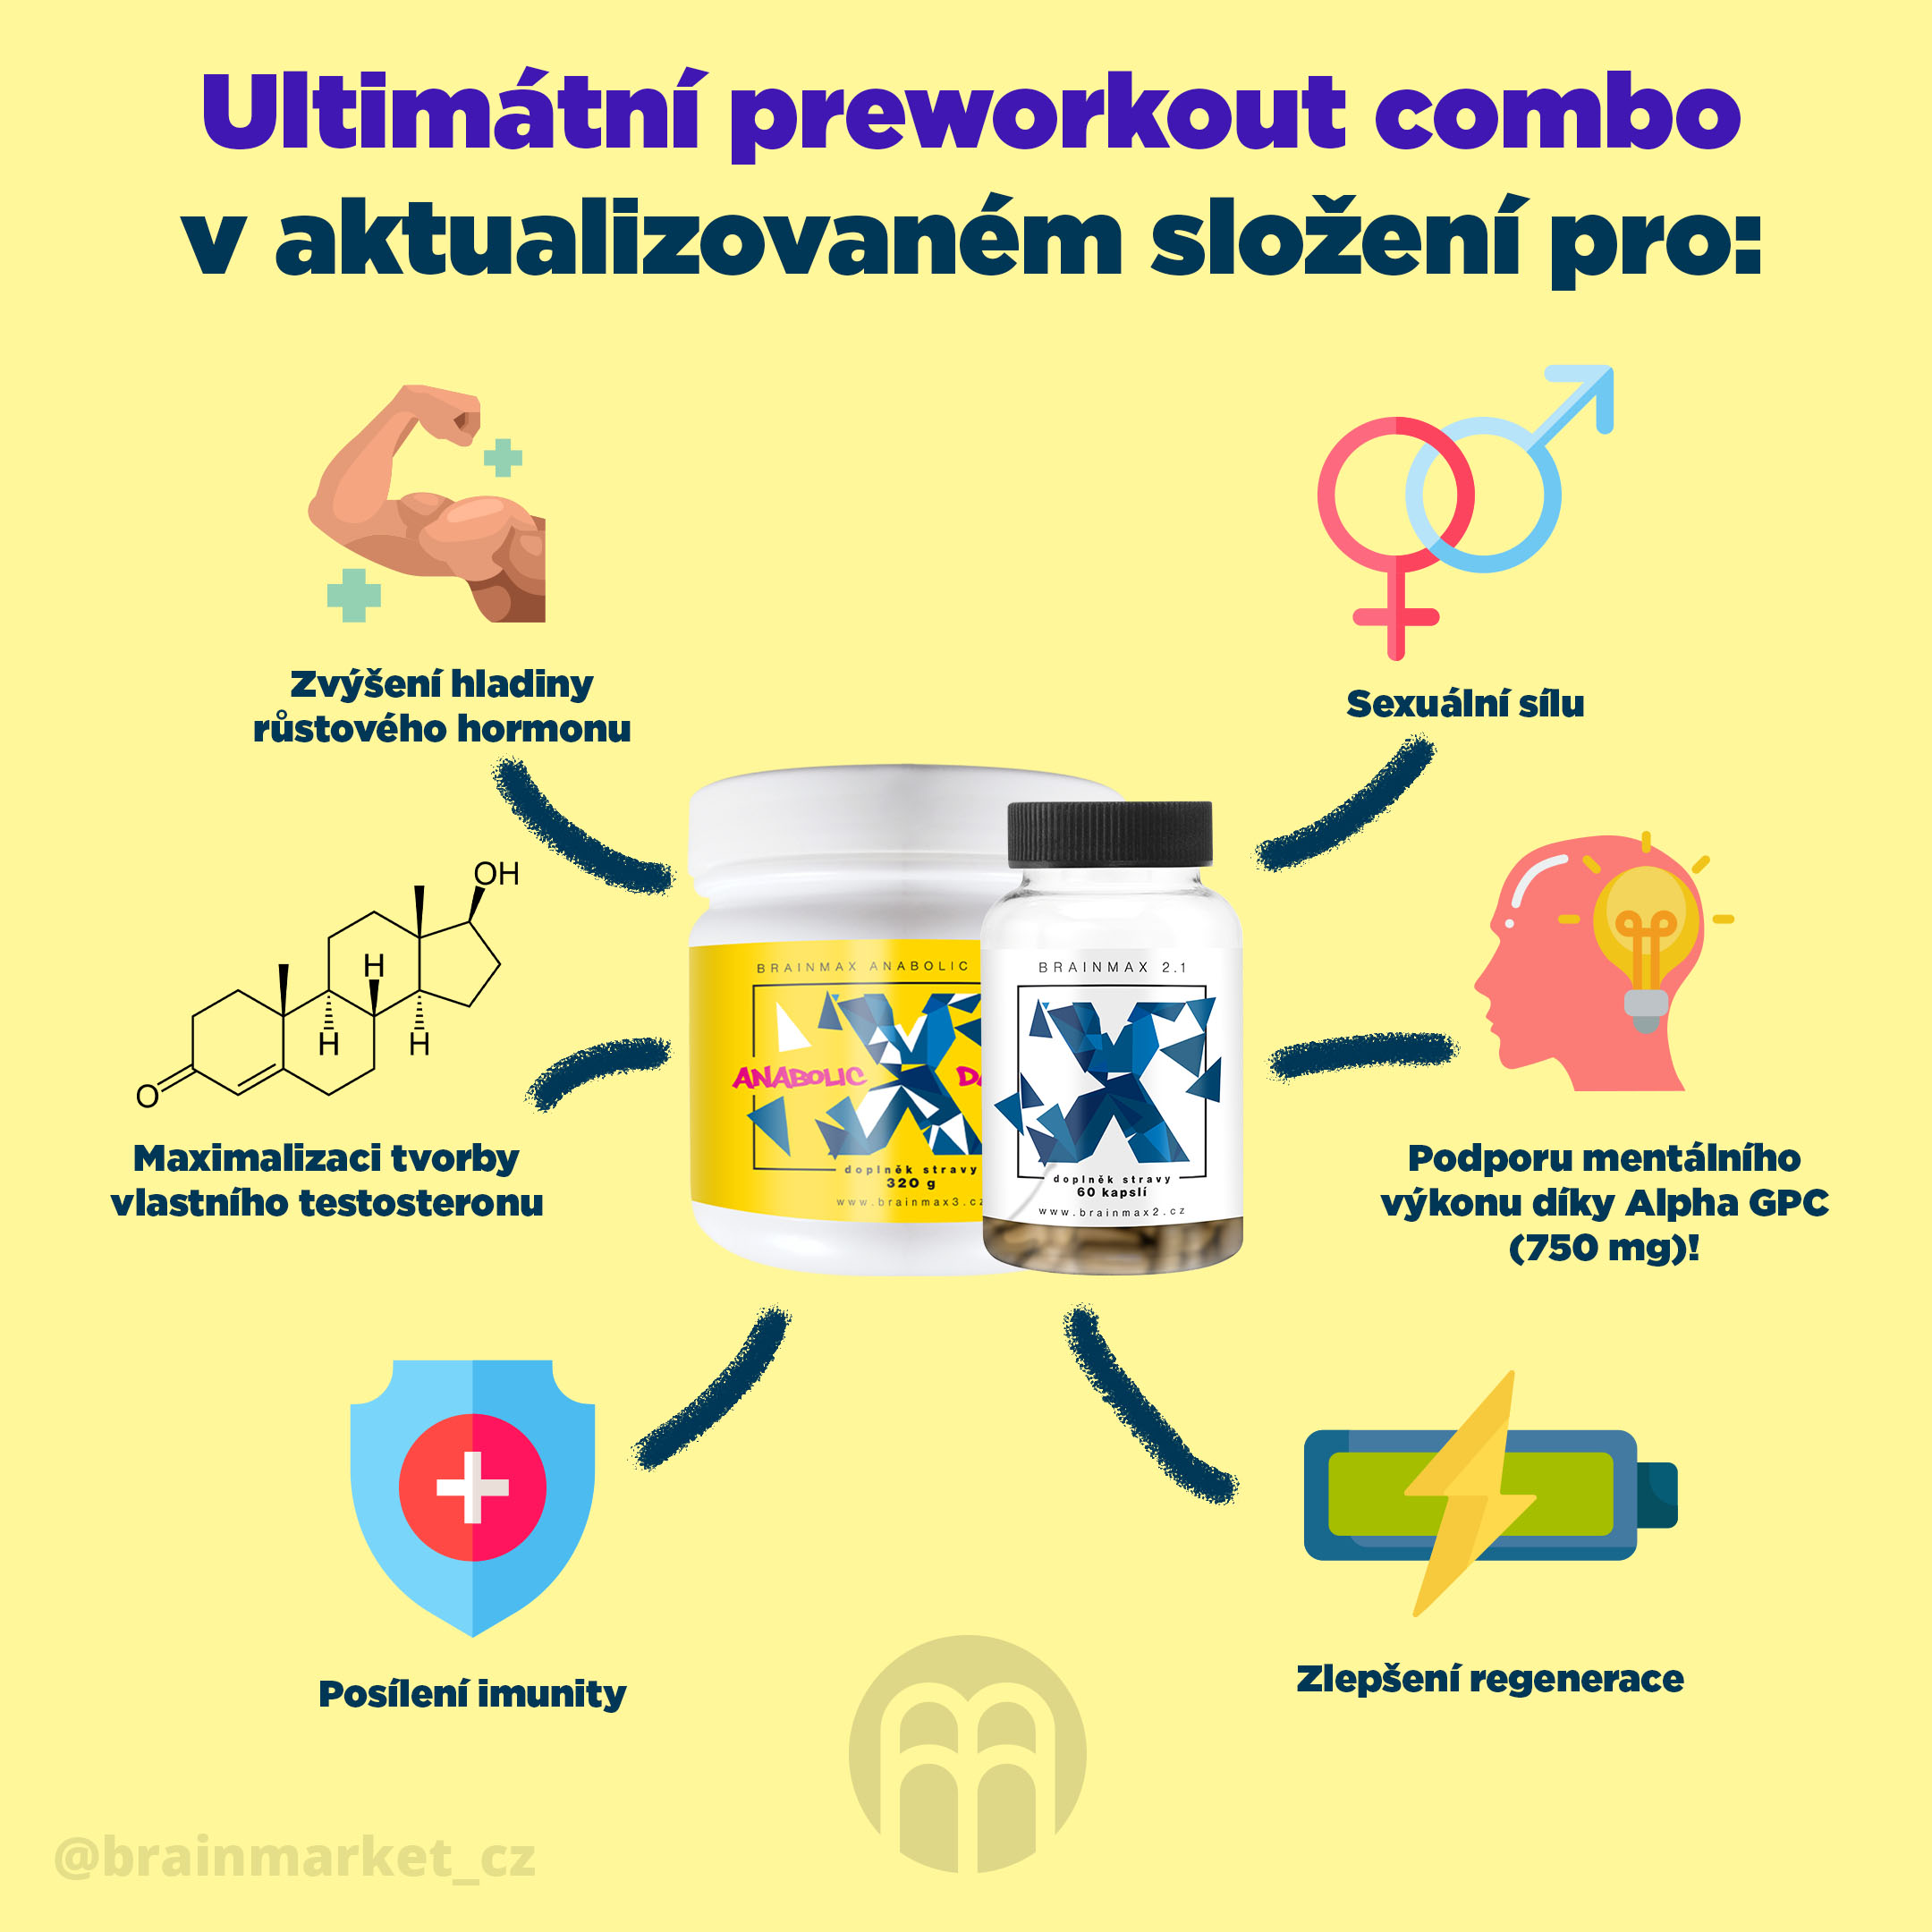 ultimatni_preworkout_combo_CZ_Infografika_Instagram_BrainMarket